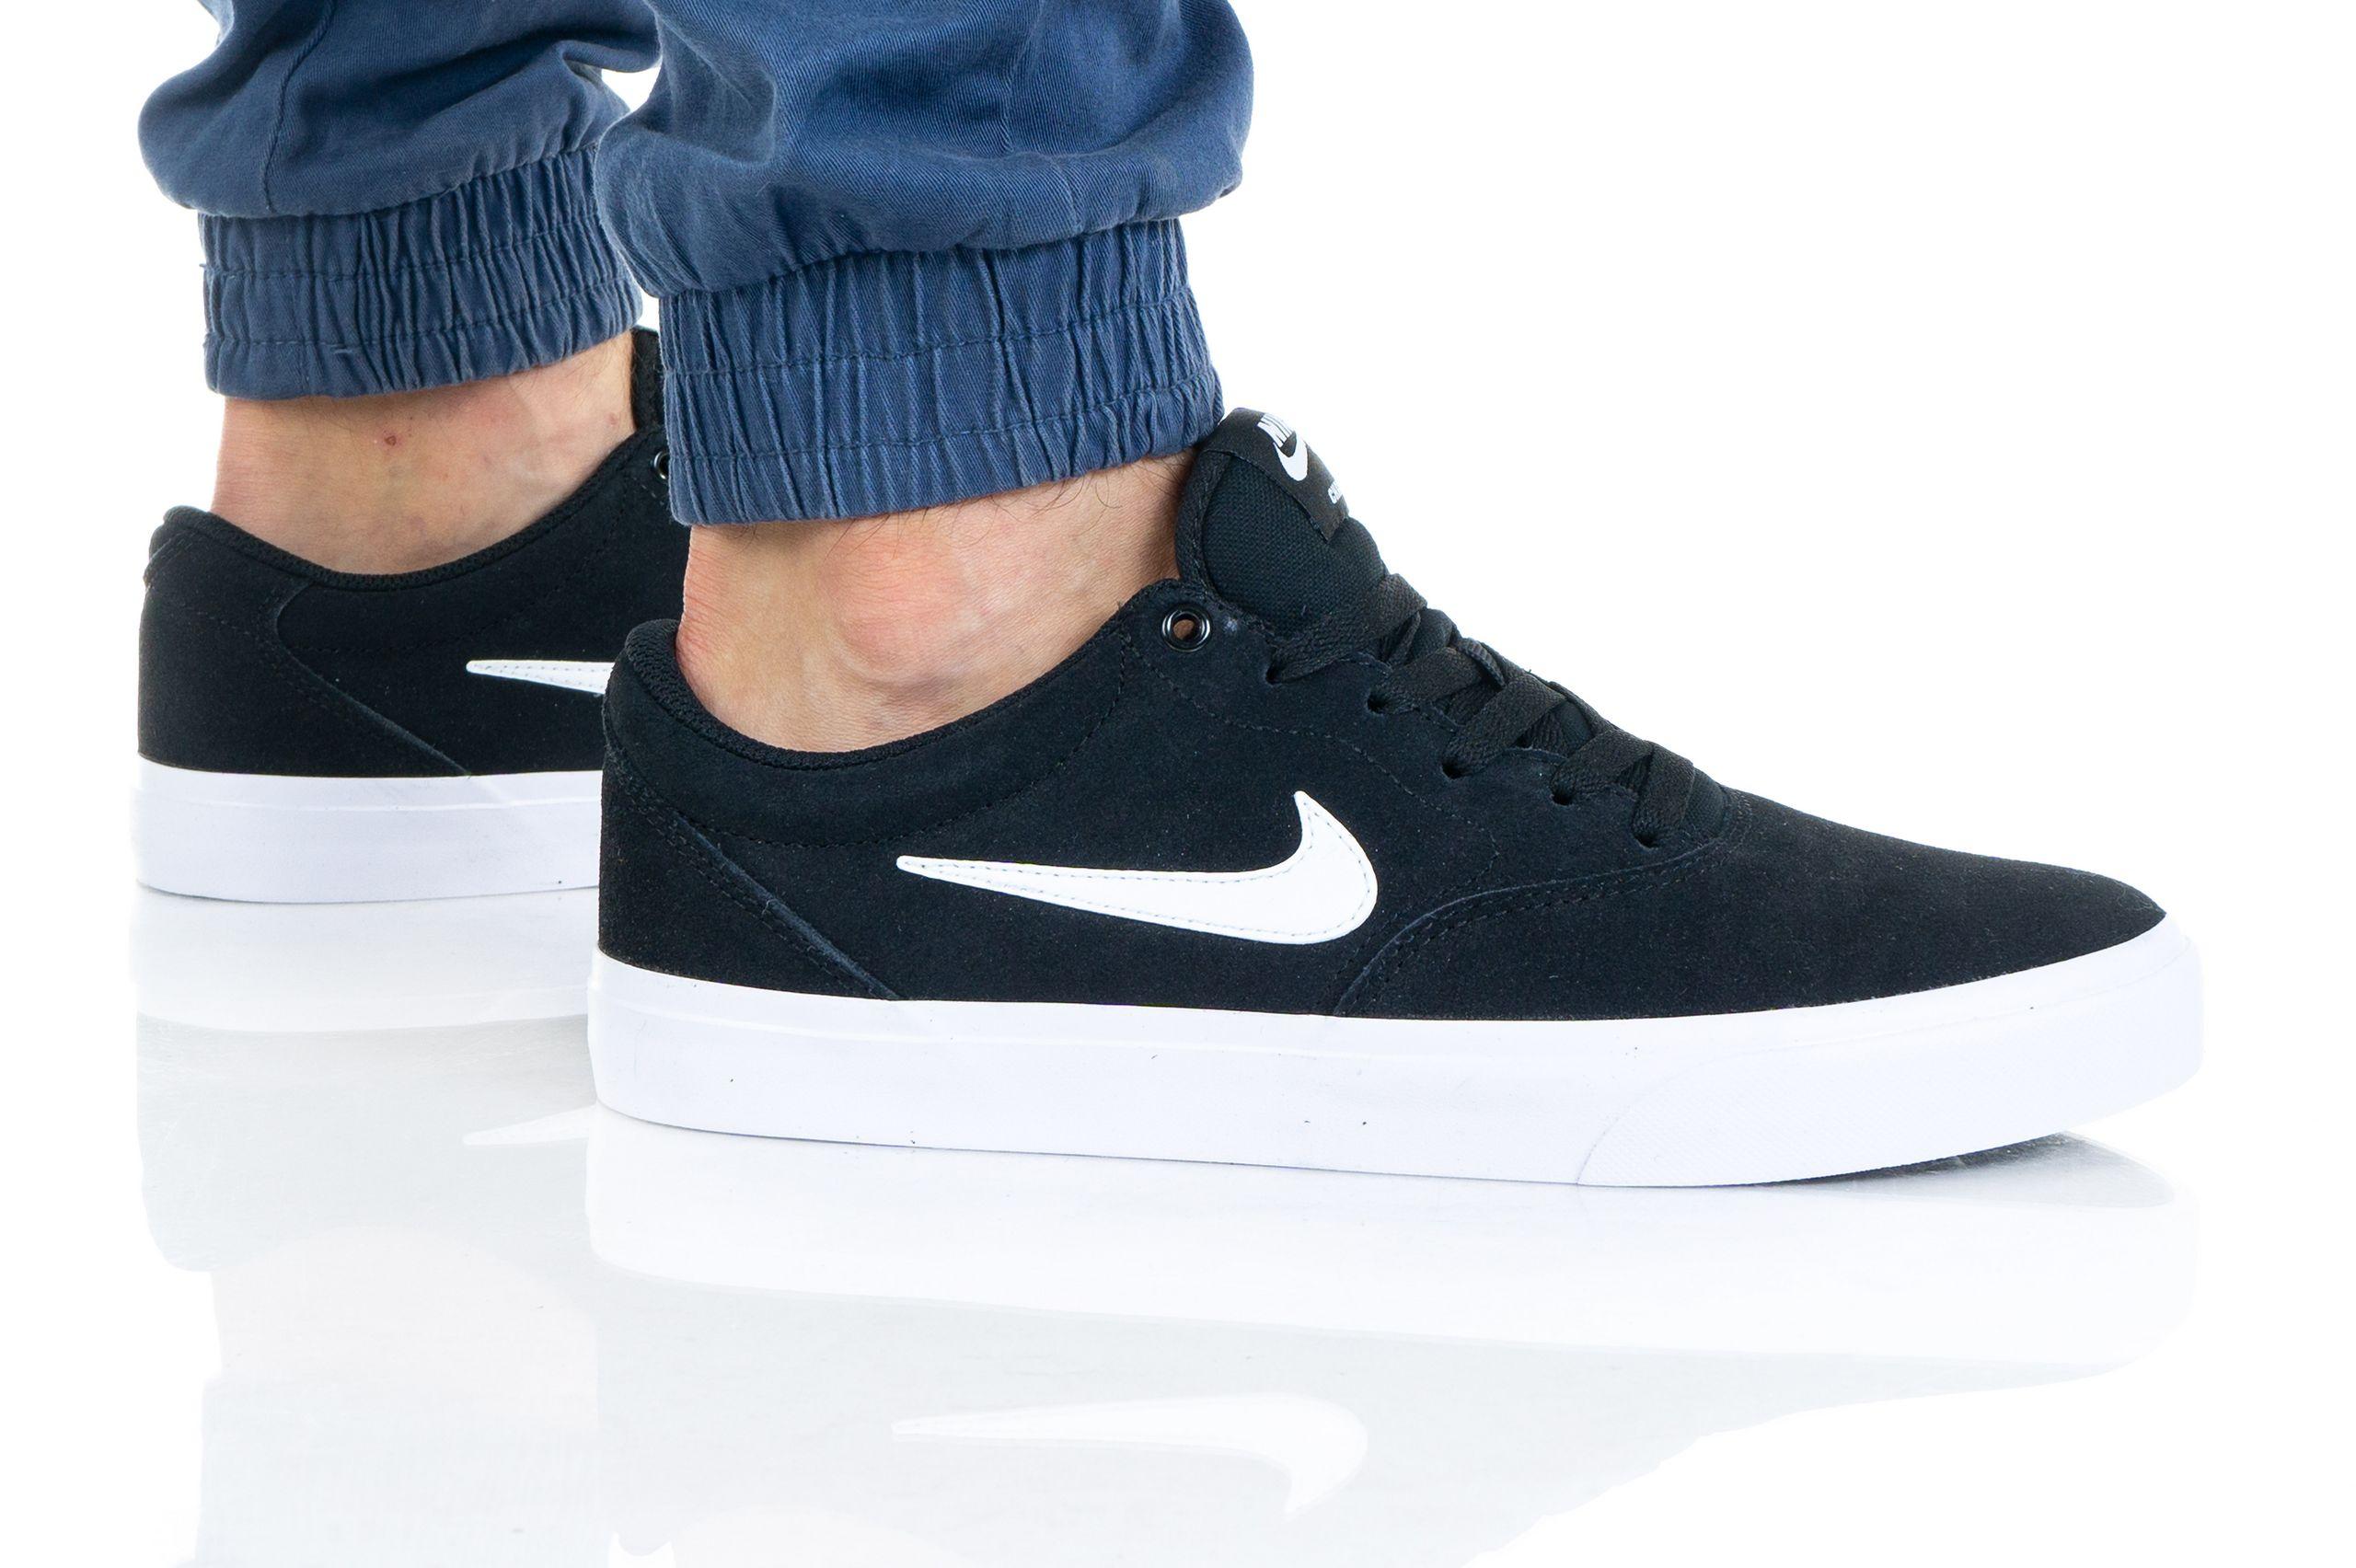 Shoes Nike SB CHARGE CNVS CD6279-601